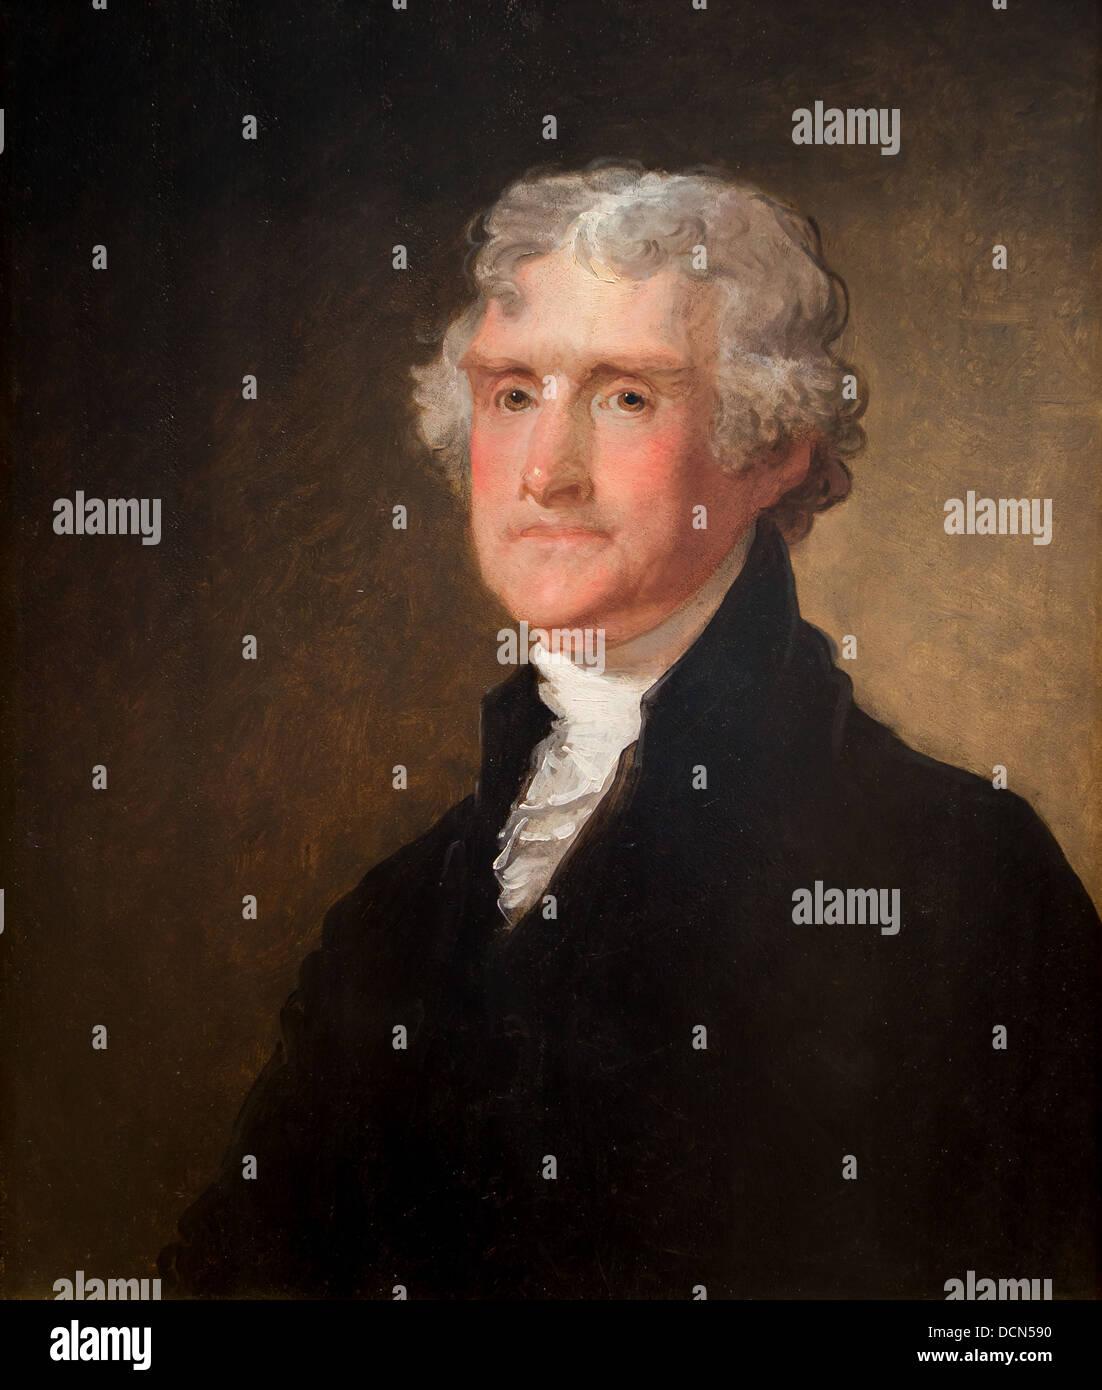 El siglo xix - Thomas Jefferson - Gilbert Stuart (1821) Philippe Sauvan-Magnet / Museo Activo Imagen De Stock